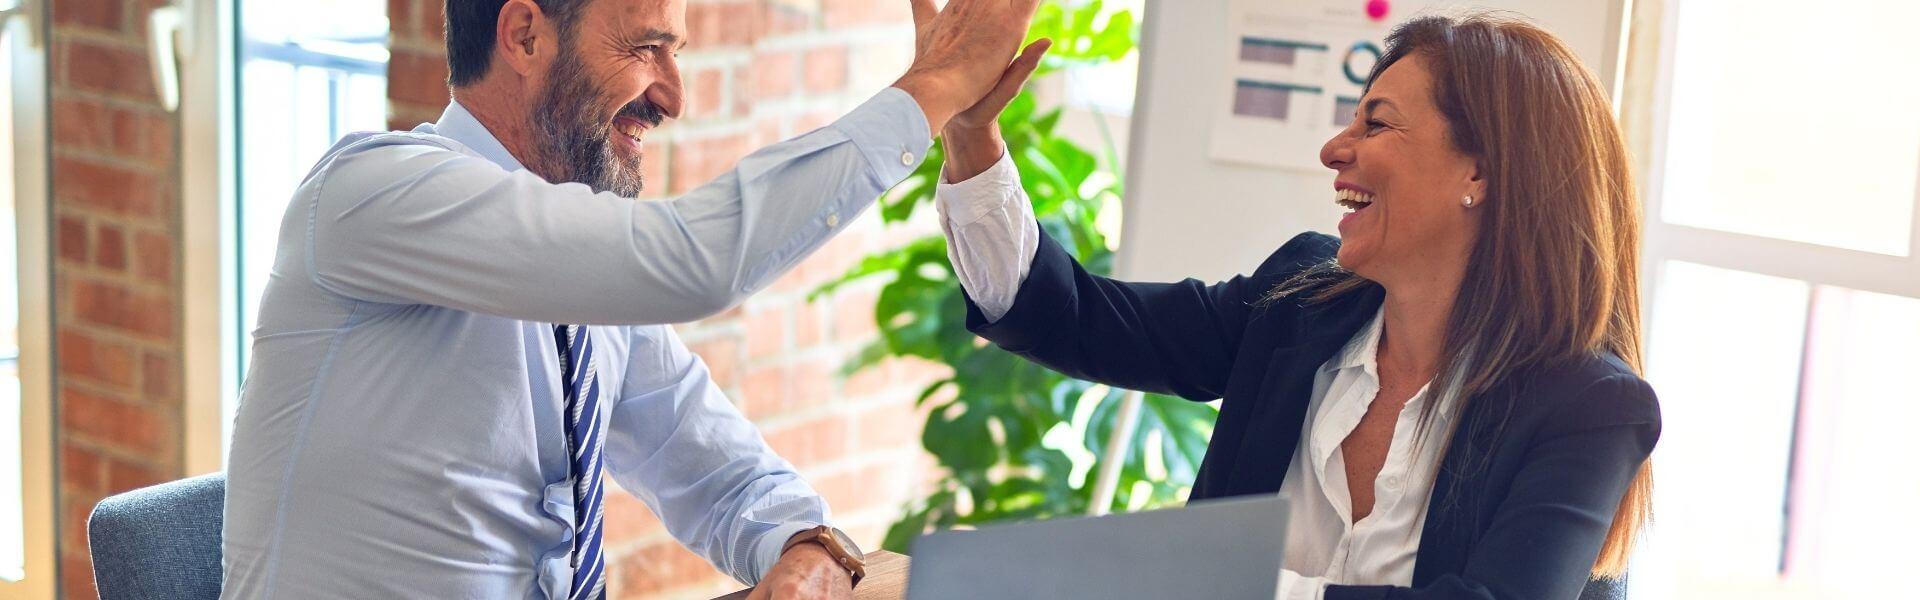 Zertifikatslehrgang KMU-Fachberater Unternehmensnachfolge